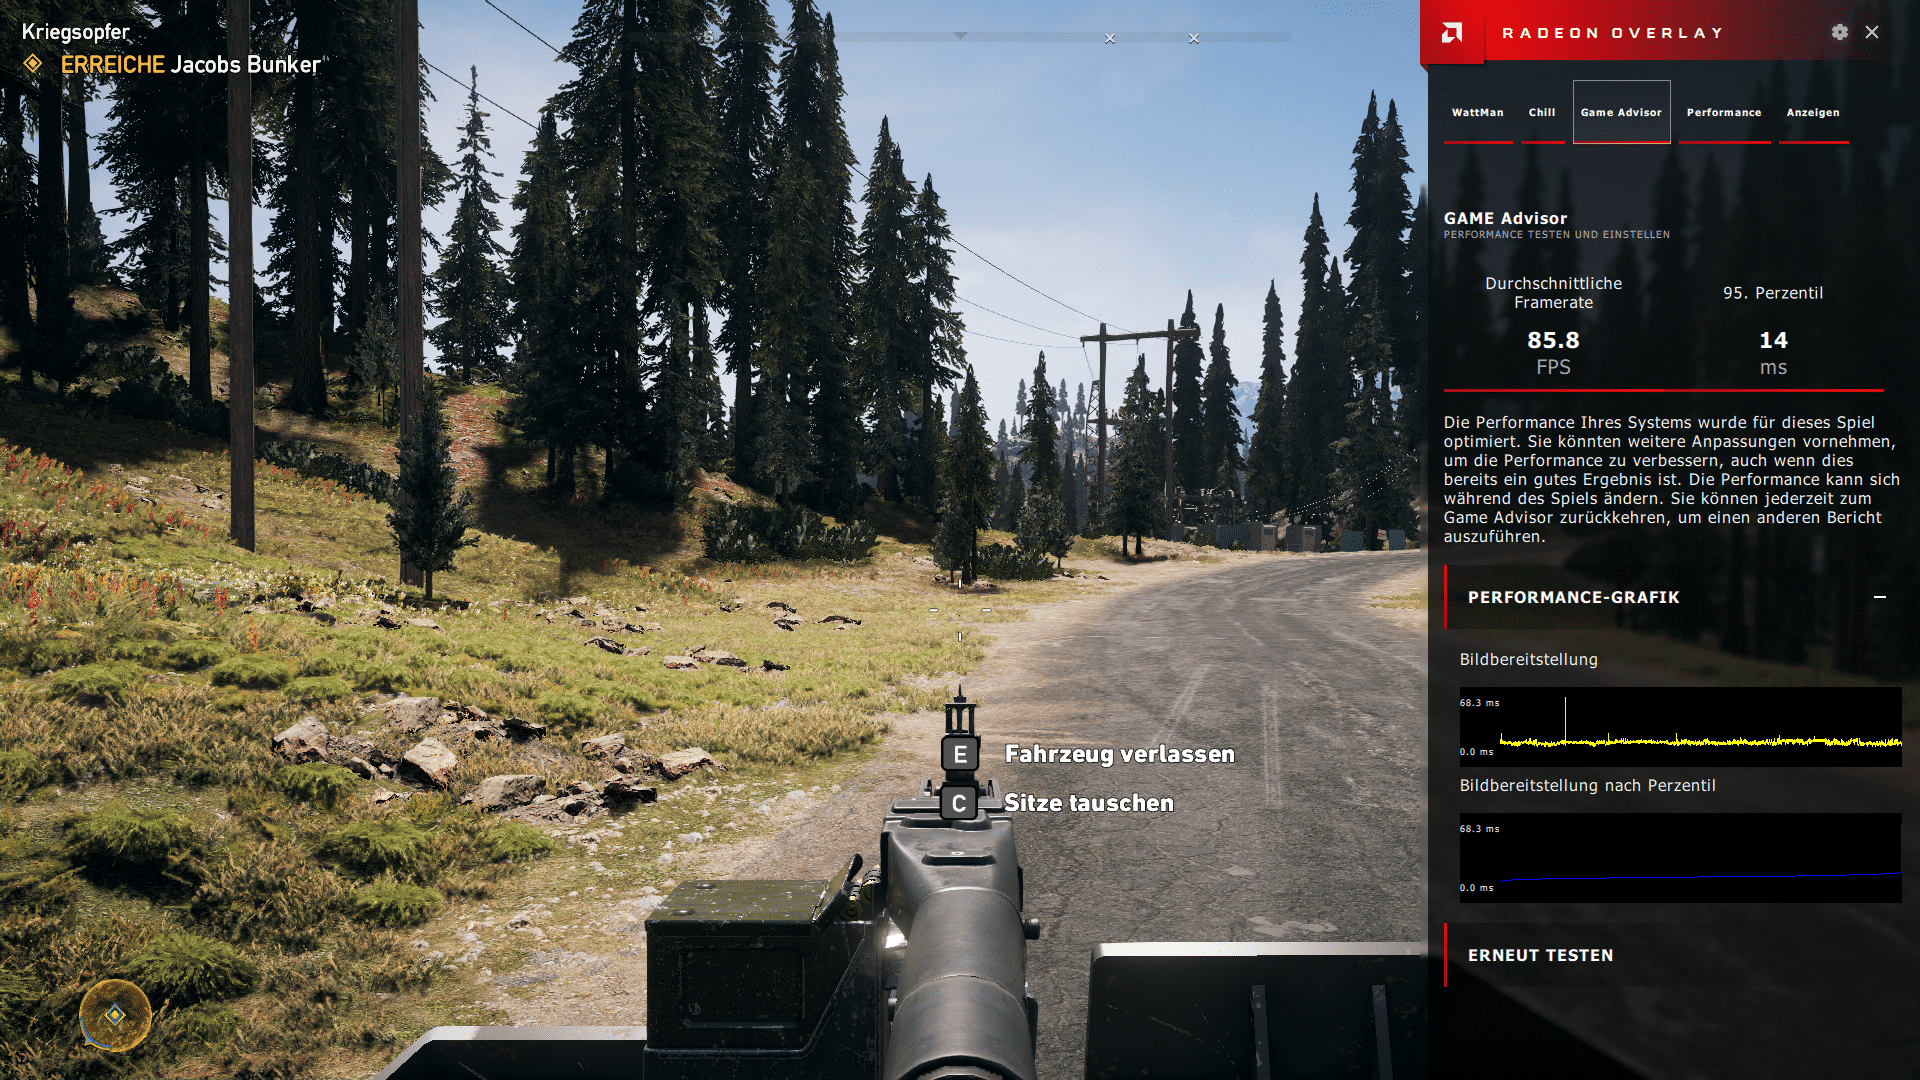 Radeon Game Advisor Frame Times